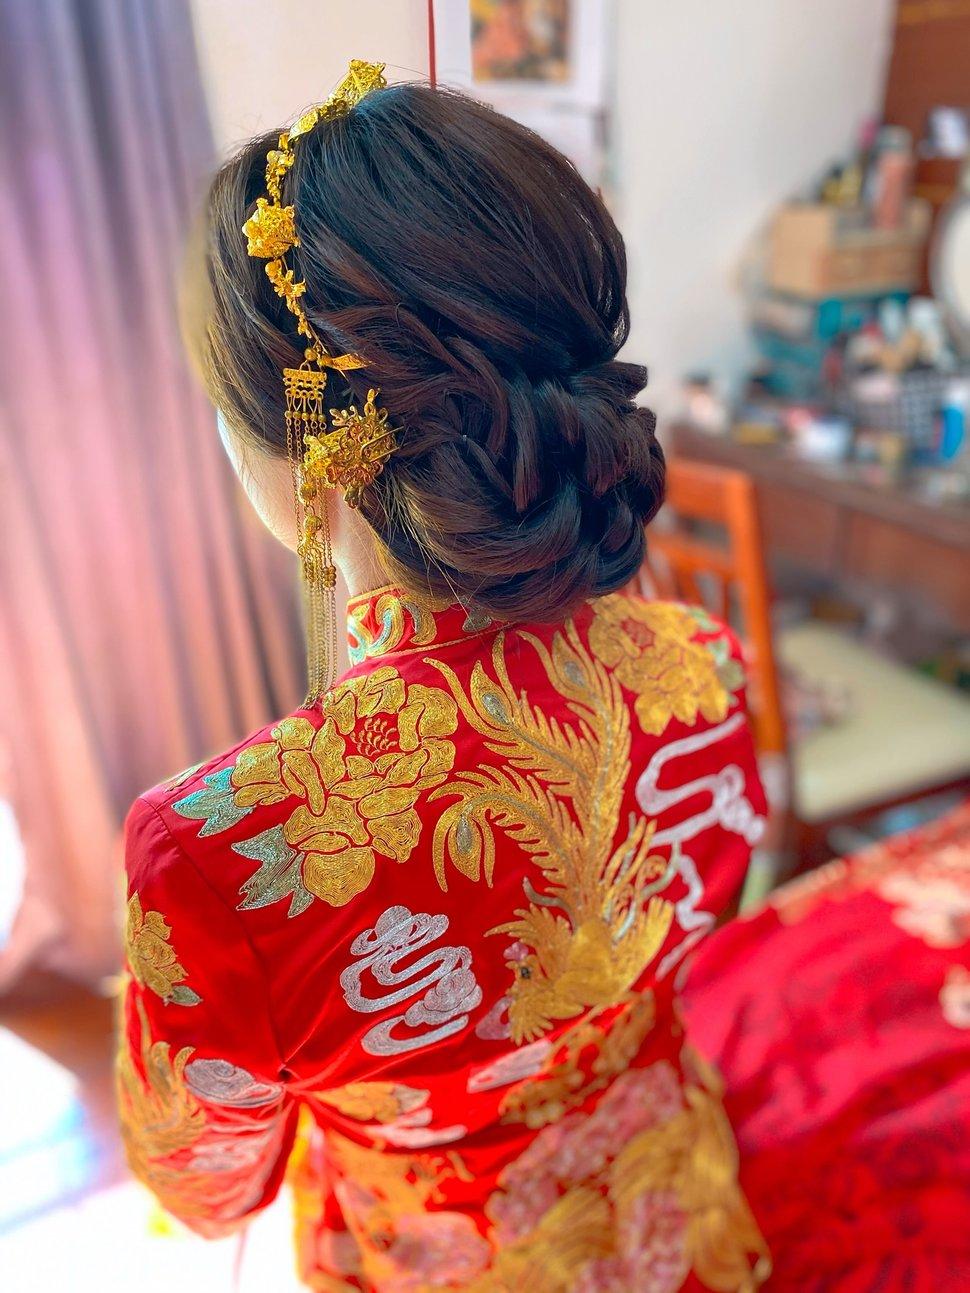 3B7E3806-8839-4919-ABCF-108A67FF7CA5 - 亞澐 Wedding 新娘秘書 整體彩妝《結婚吧》